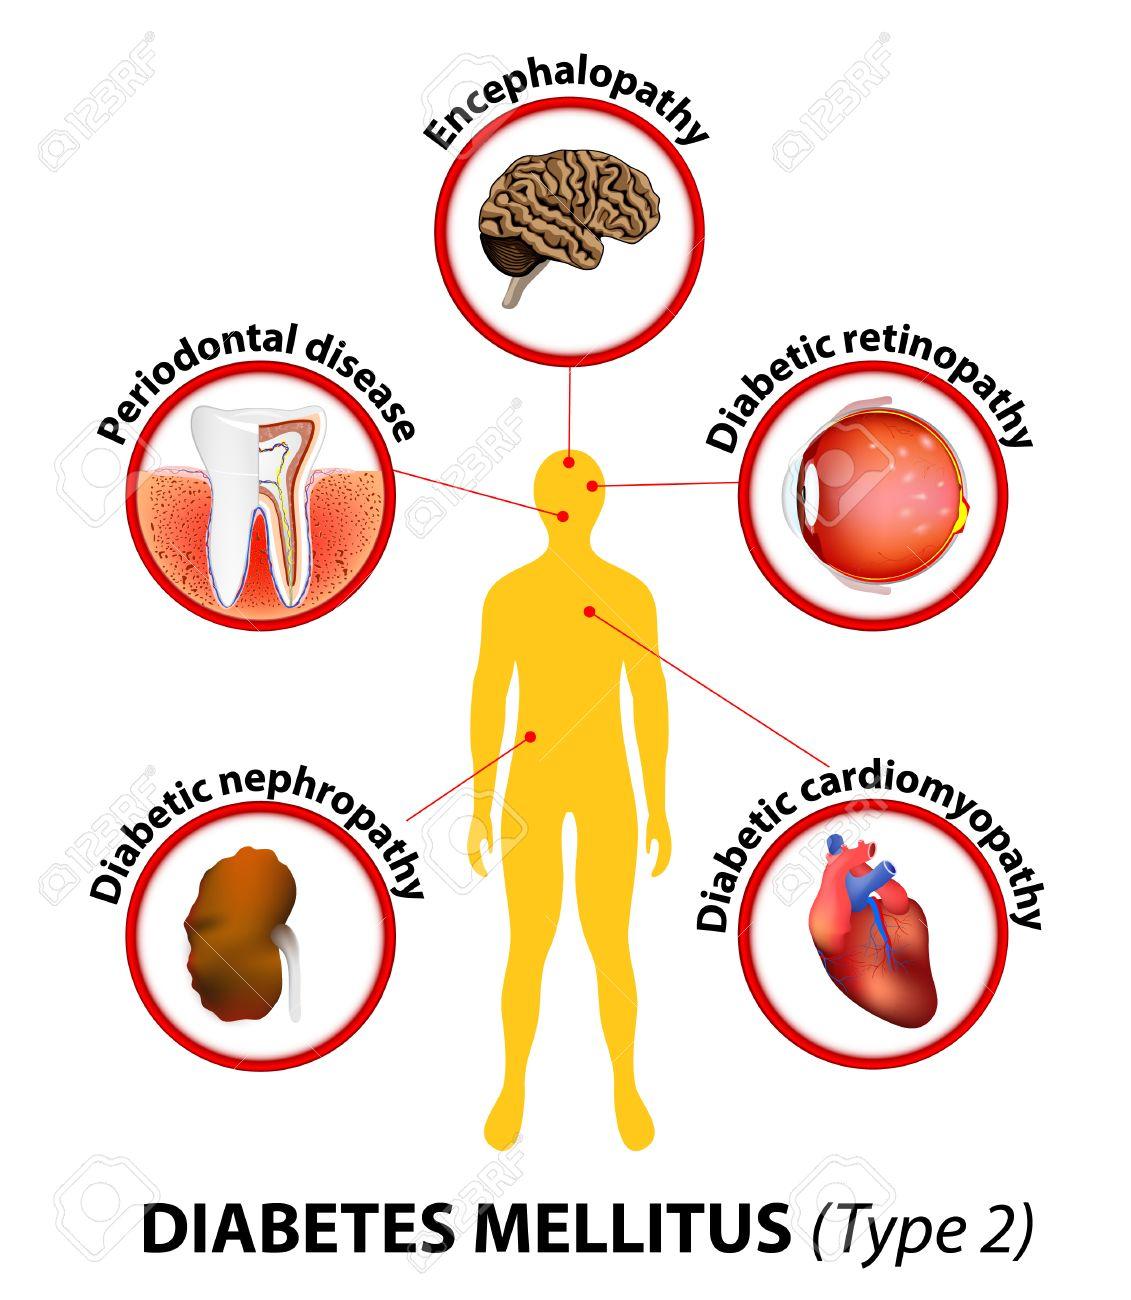 sobre la diabetes mellitus tipo 2